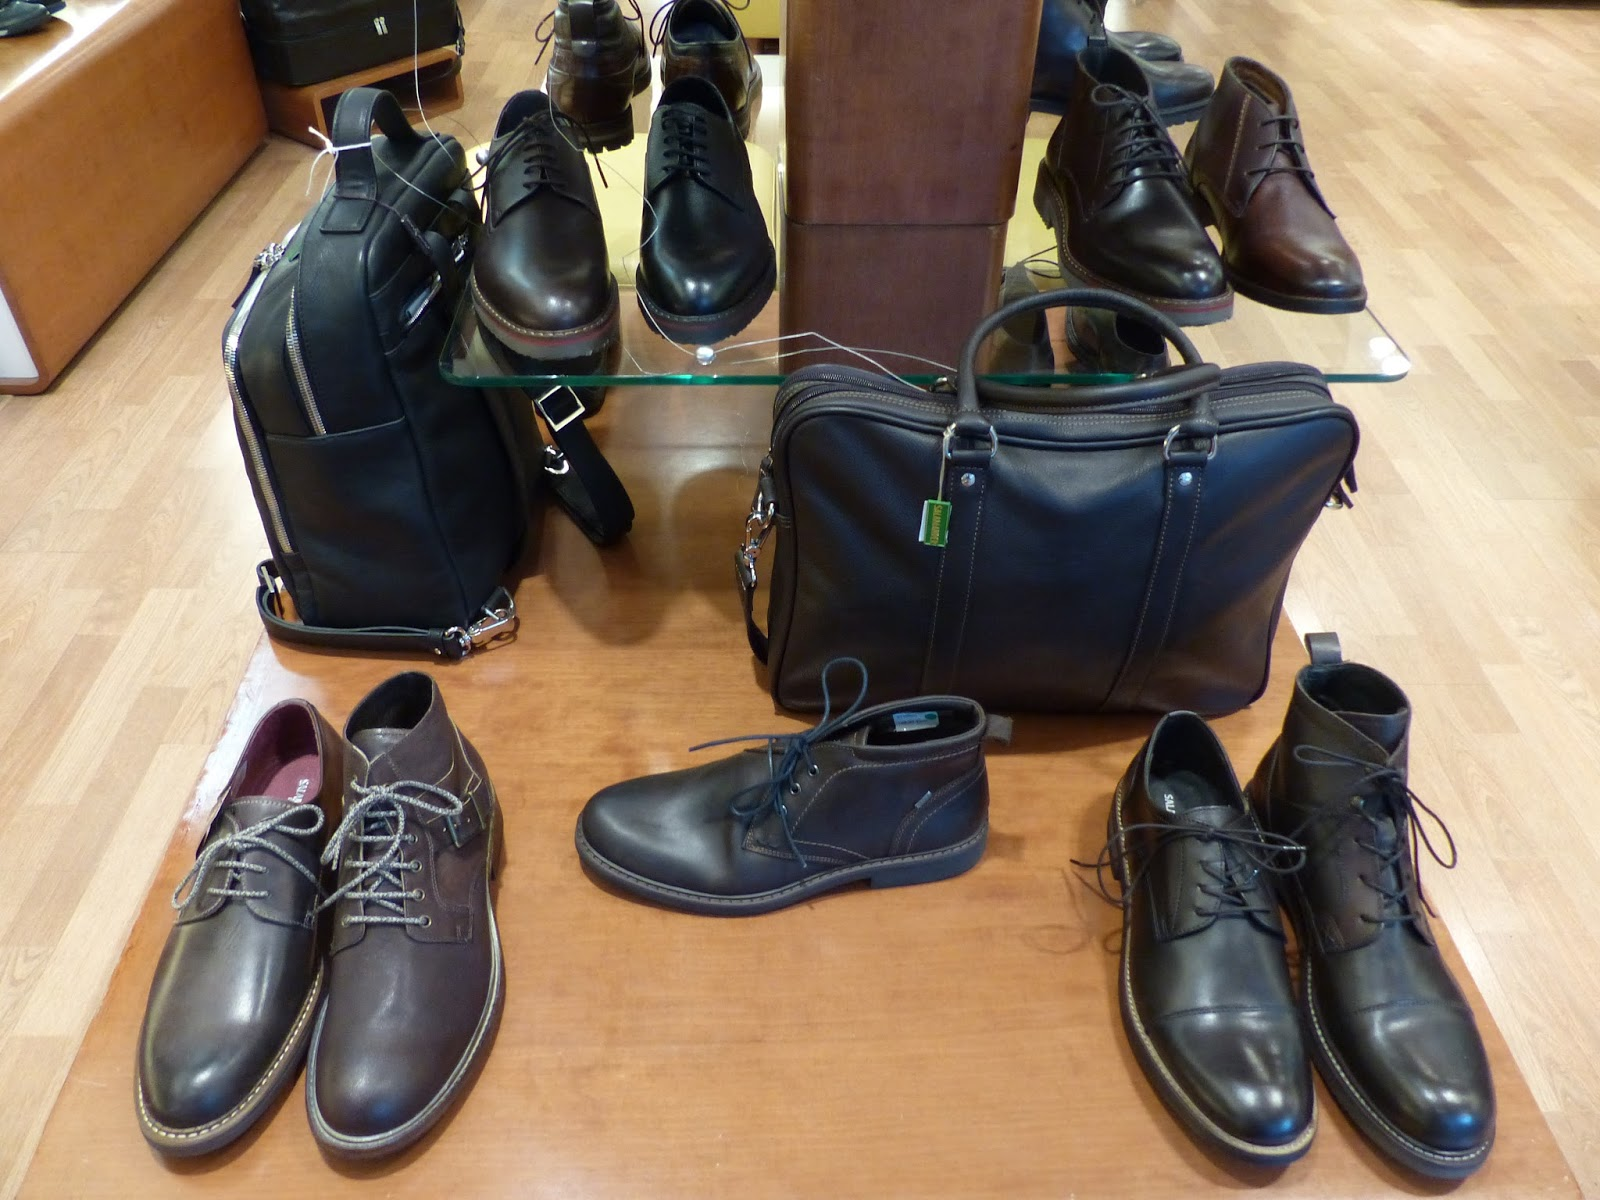 0kxpno8nw Escarpins Femme Collection Salamander Chaussures 2016 DEIH9YW2